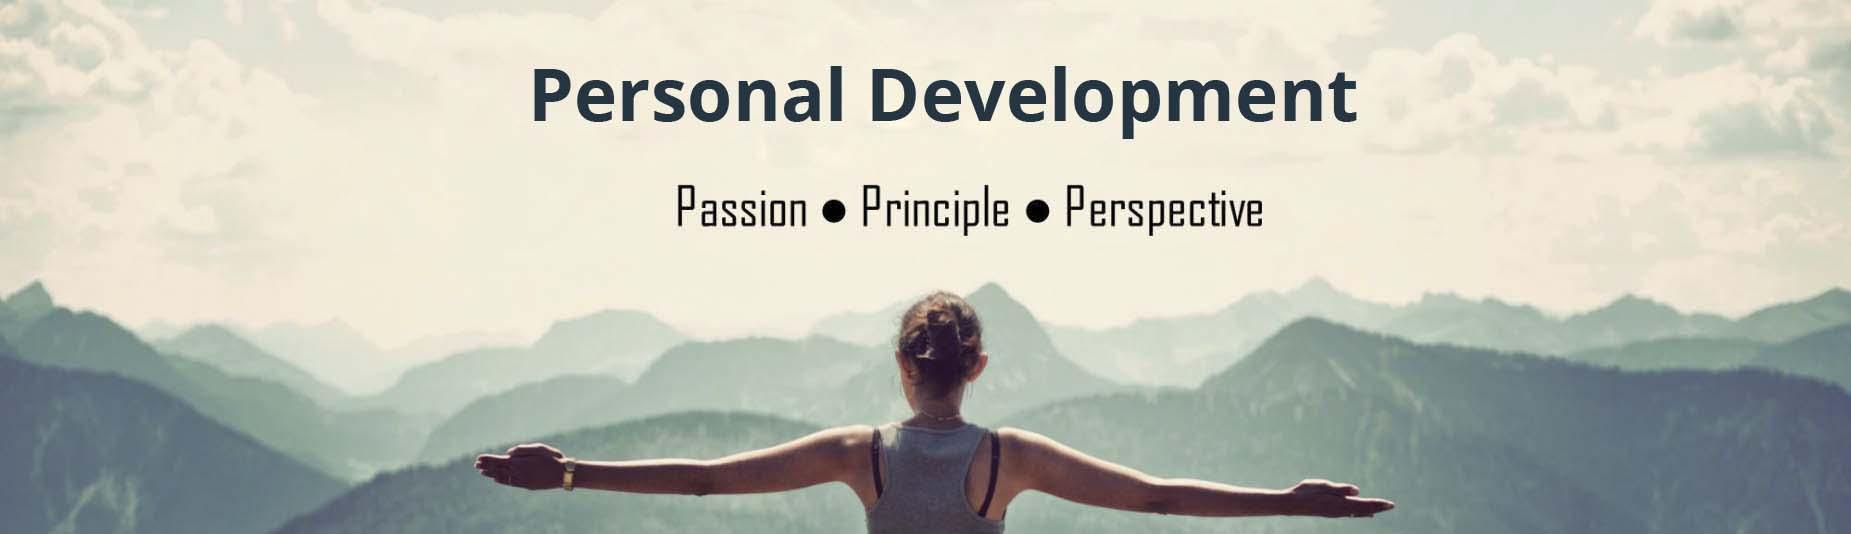 personal_dev_banner_2